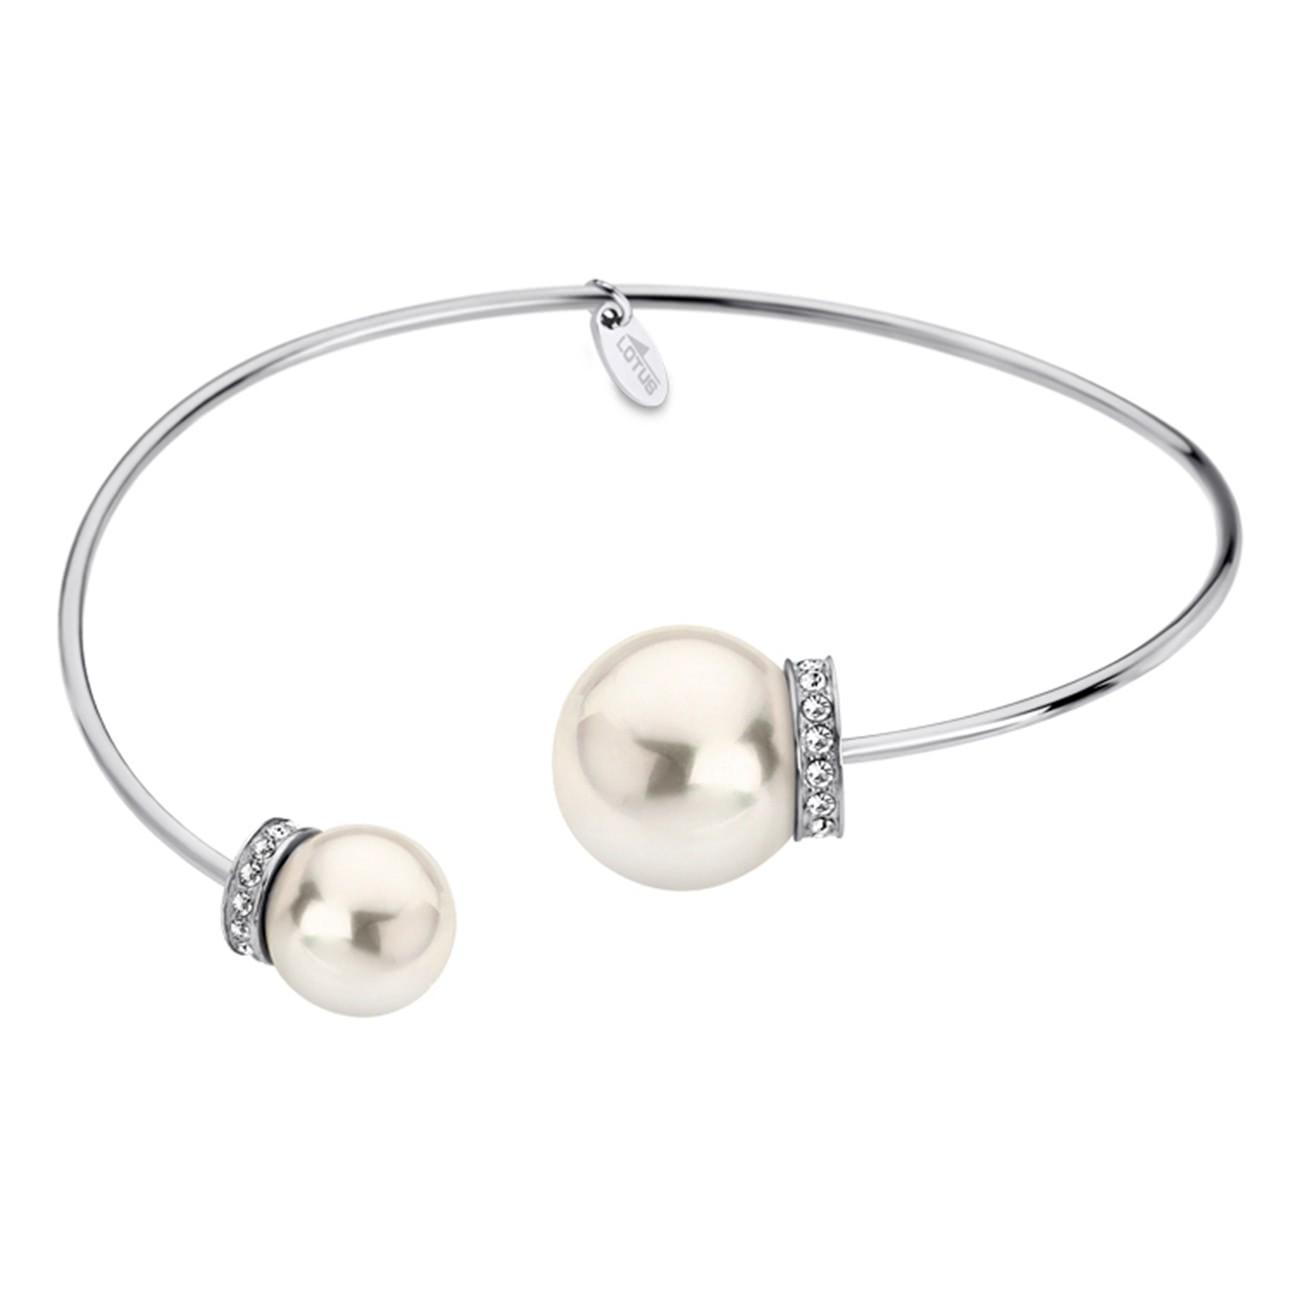 LOTUS Style Armband Damen Armreif Perle LS1824-2/1 Edelstahl JLS1824-2-1